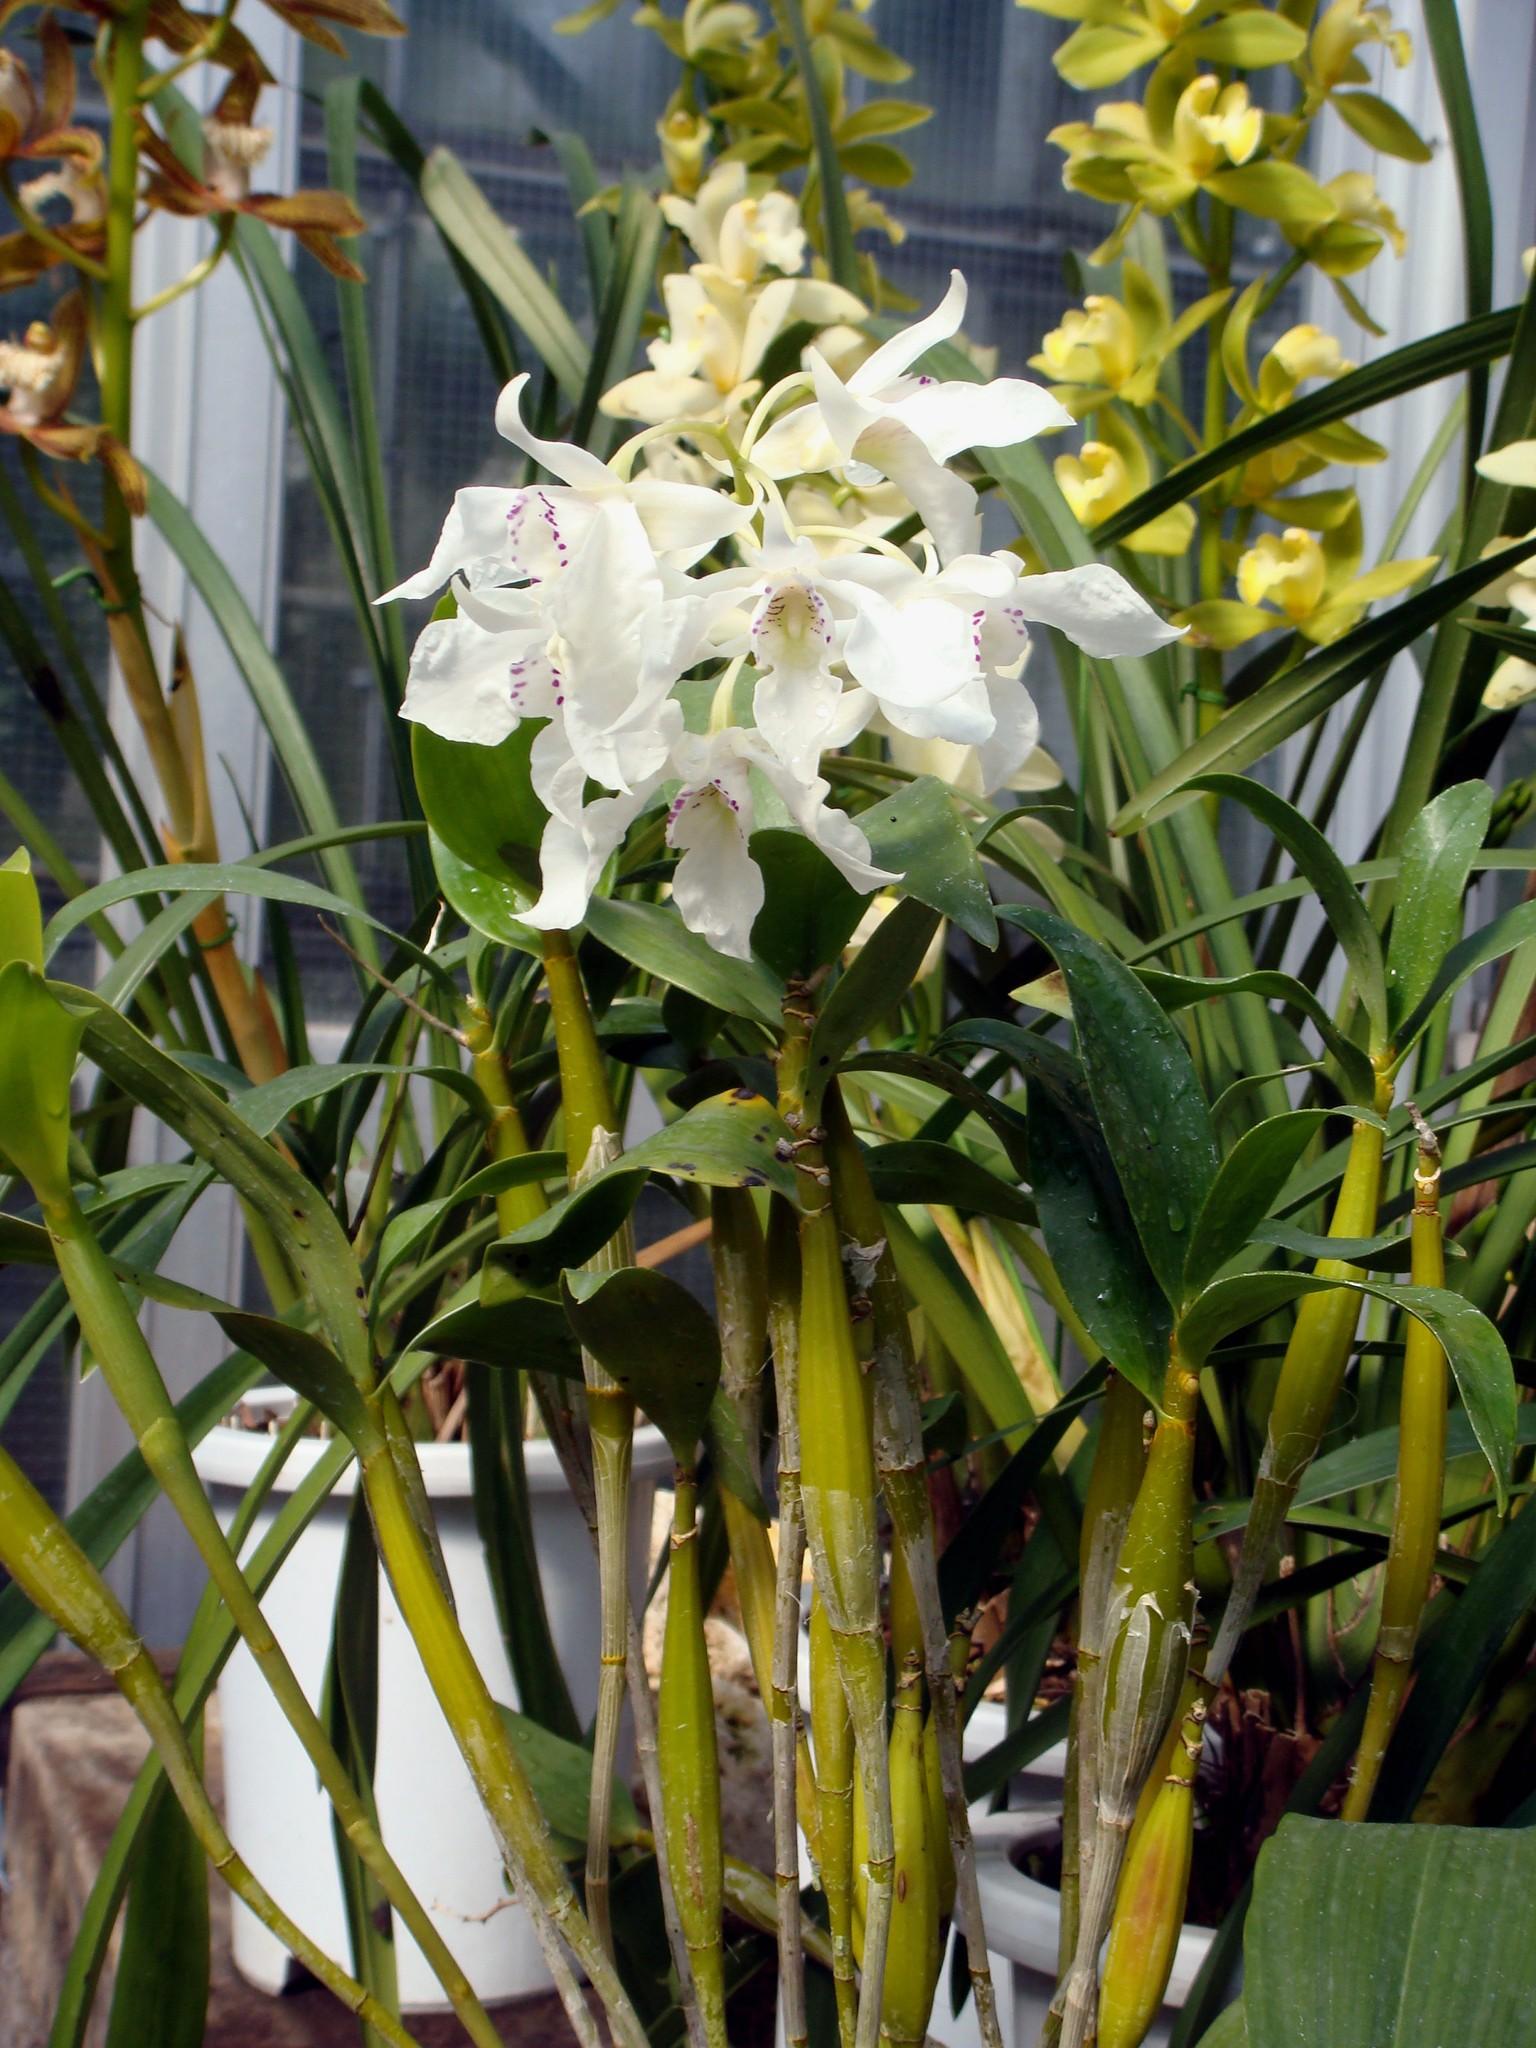 http://orchids.la.coocan.jp/Dendrobium/Dendrobium%20johnsoniae/DSC02711.JPG